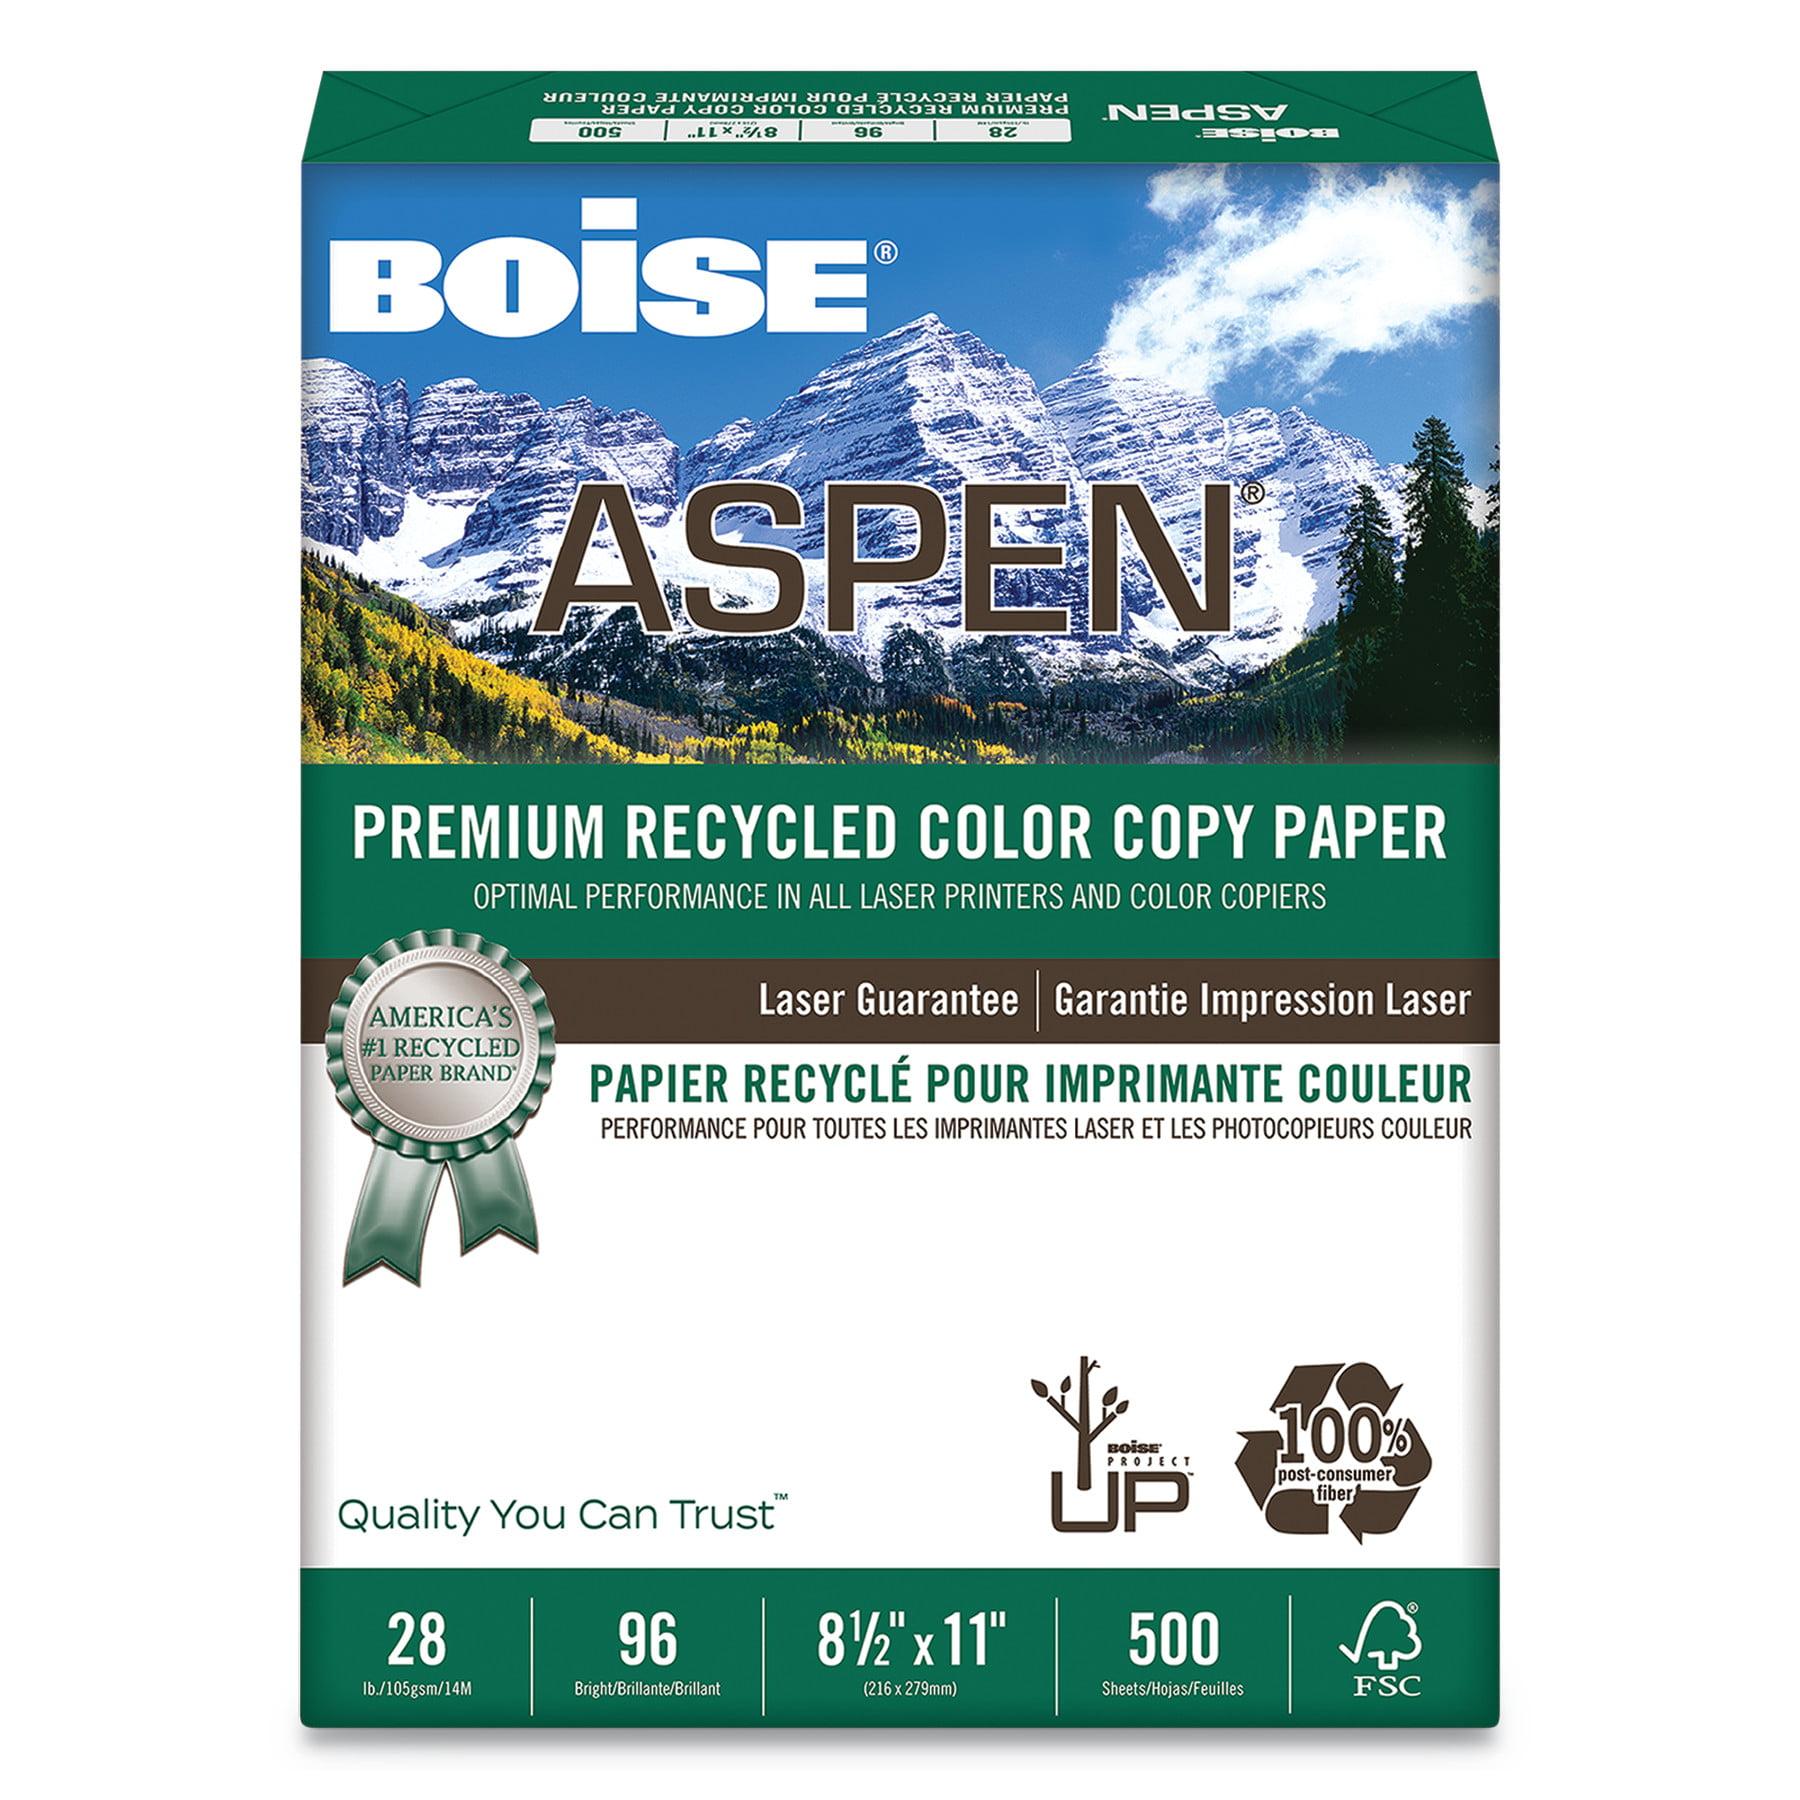 Boise ASPEN Premium Recycled Paper, 96 Bright, 28lb, Letter, White, 500 Sheets -CASACC2811